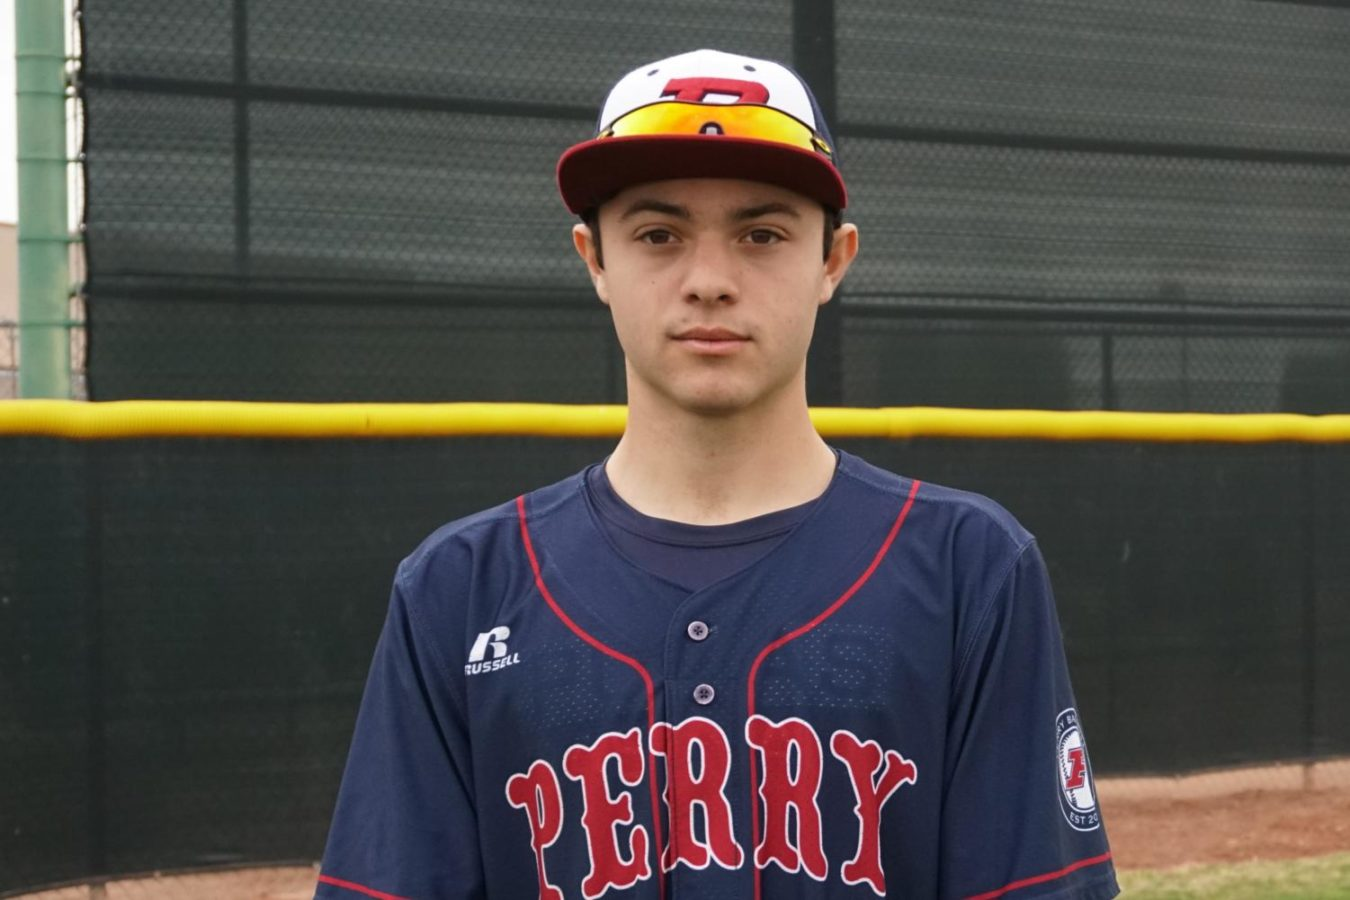 Michael Camarra mug shot for Perry baseball